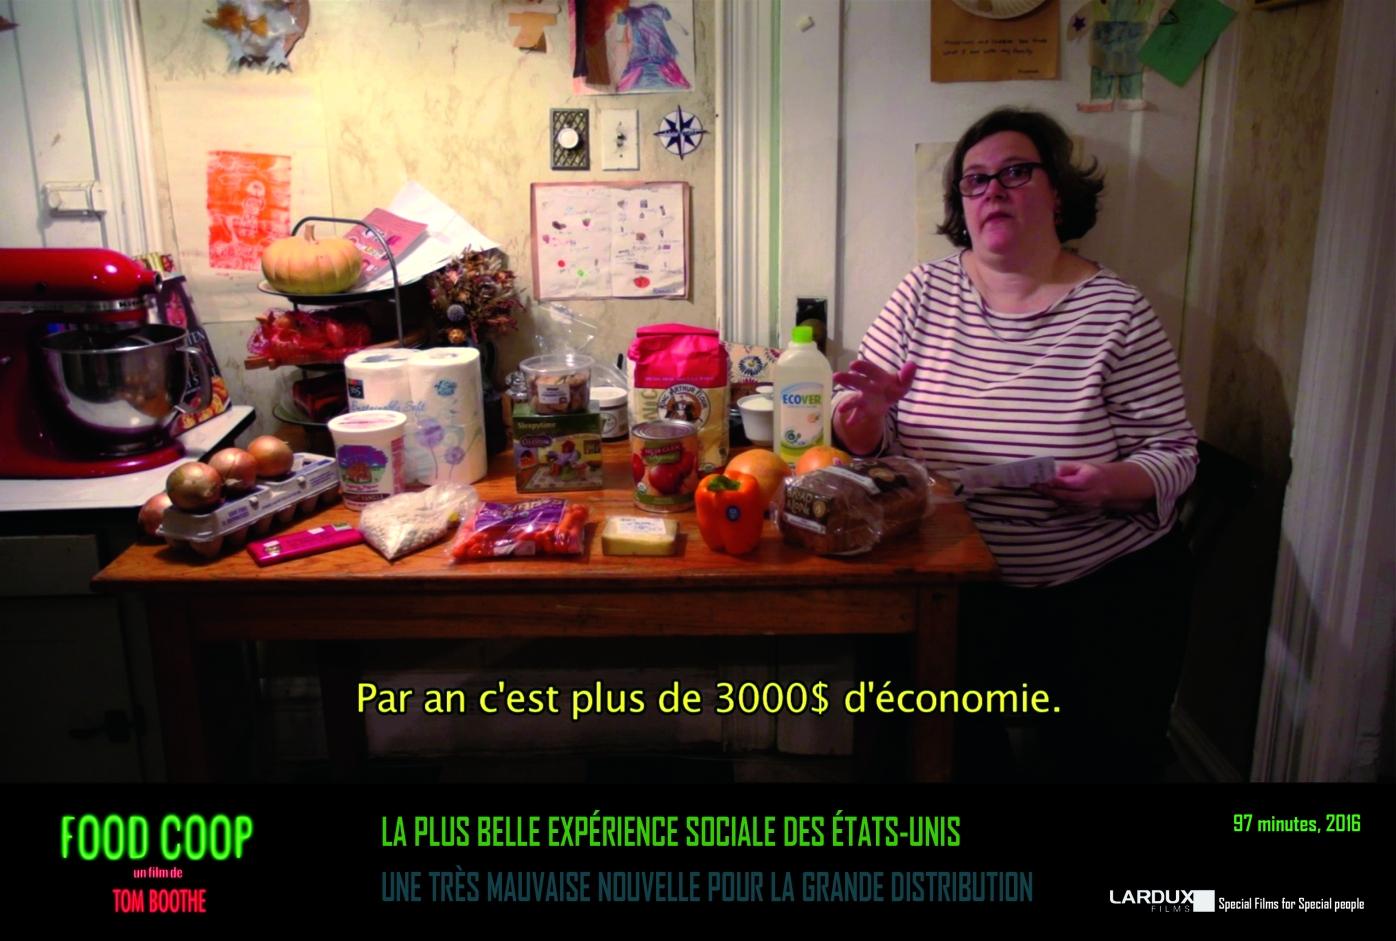 FOOD COOP  Food-coop-photo-exploitation-06